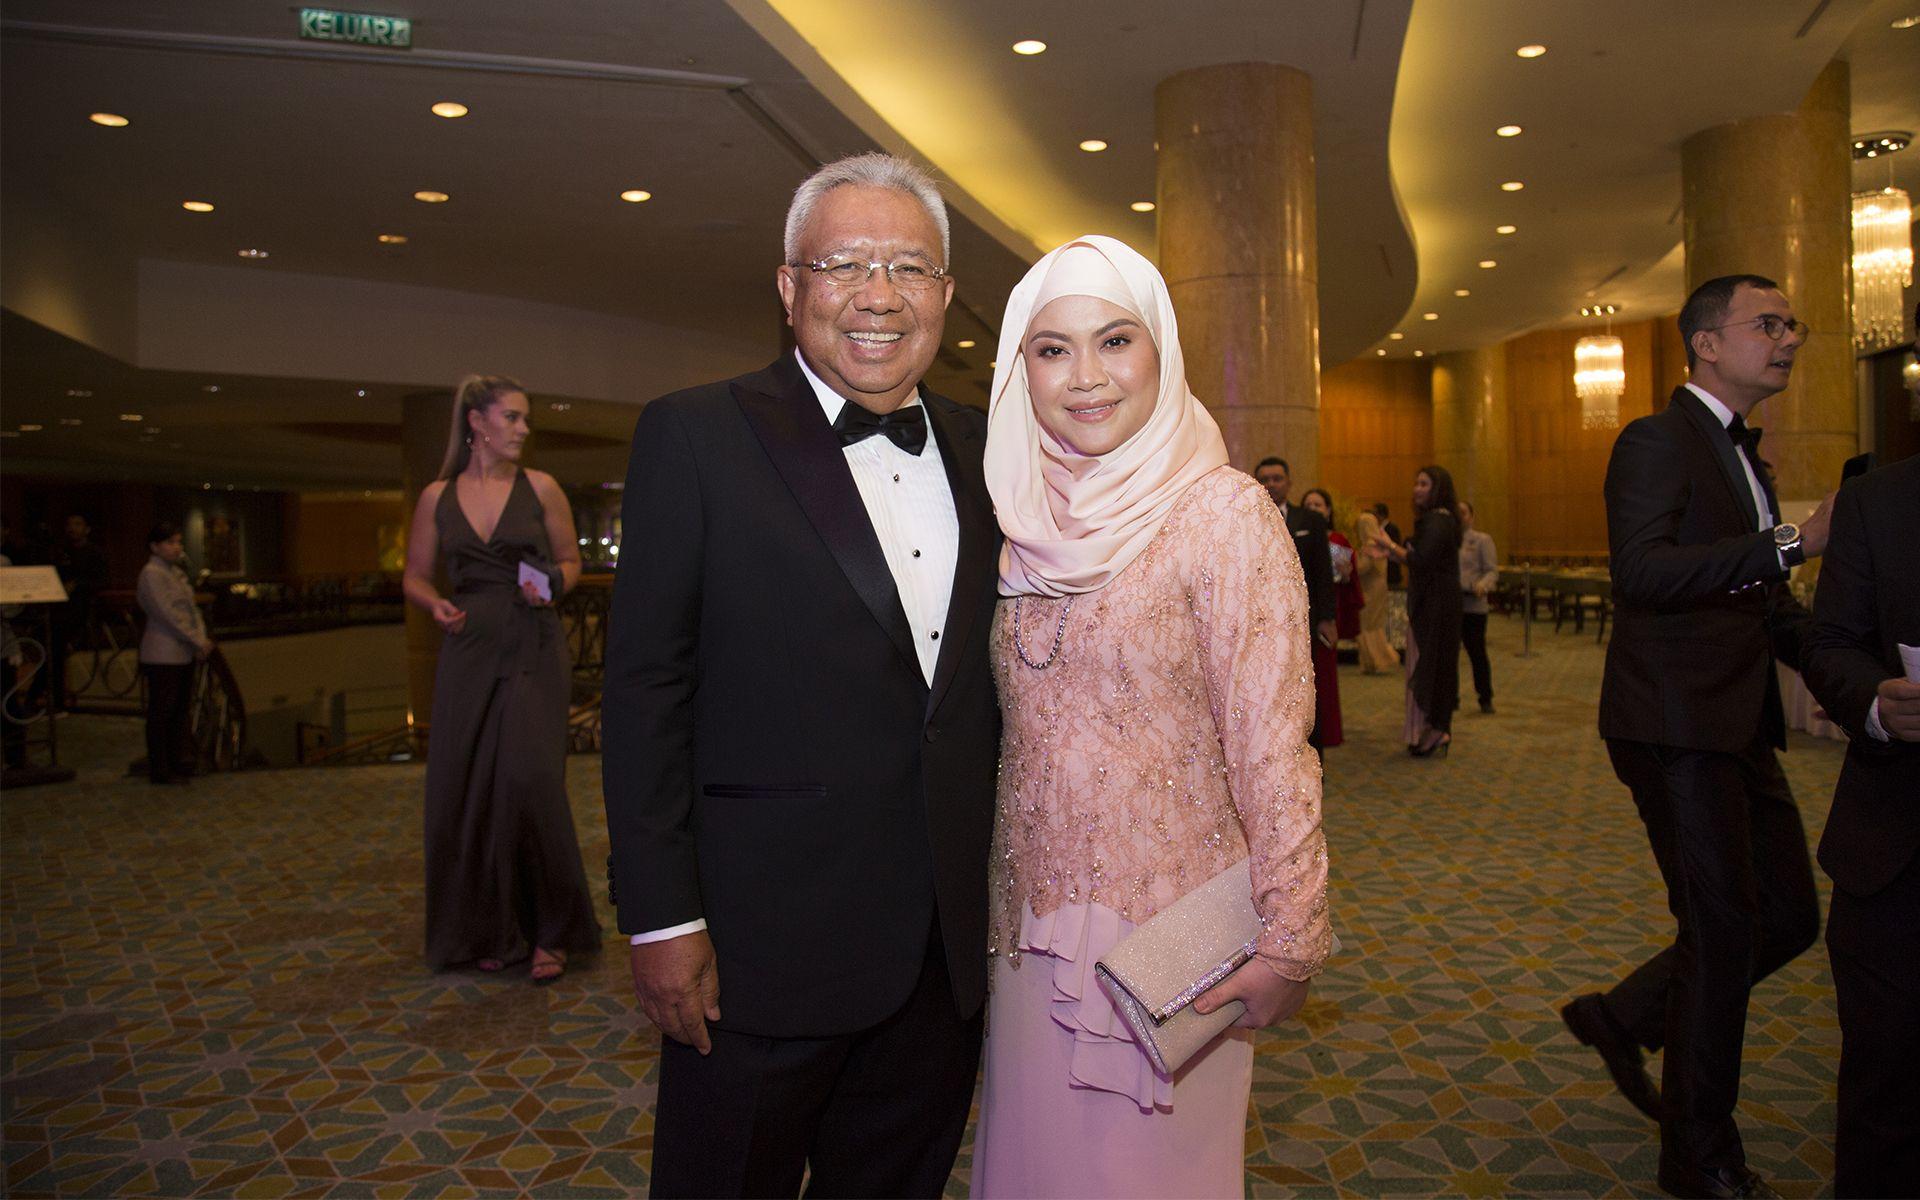 Ghaus Ismail and Liyana Ghaus